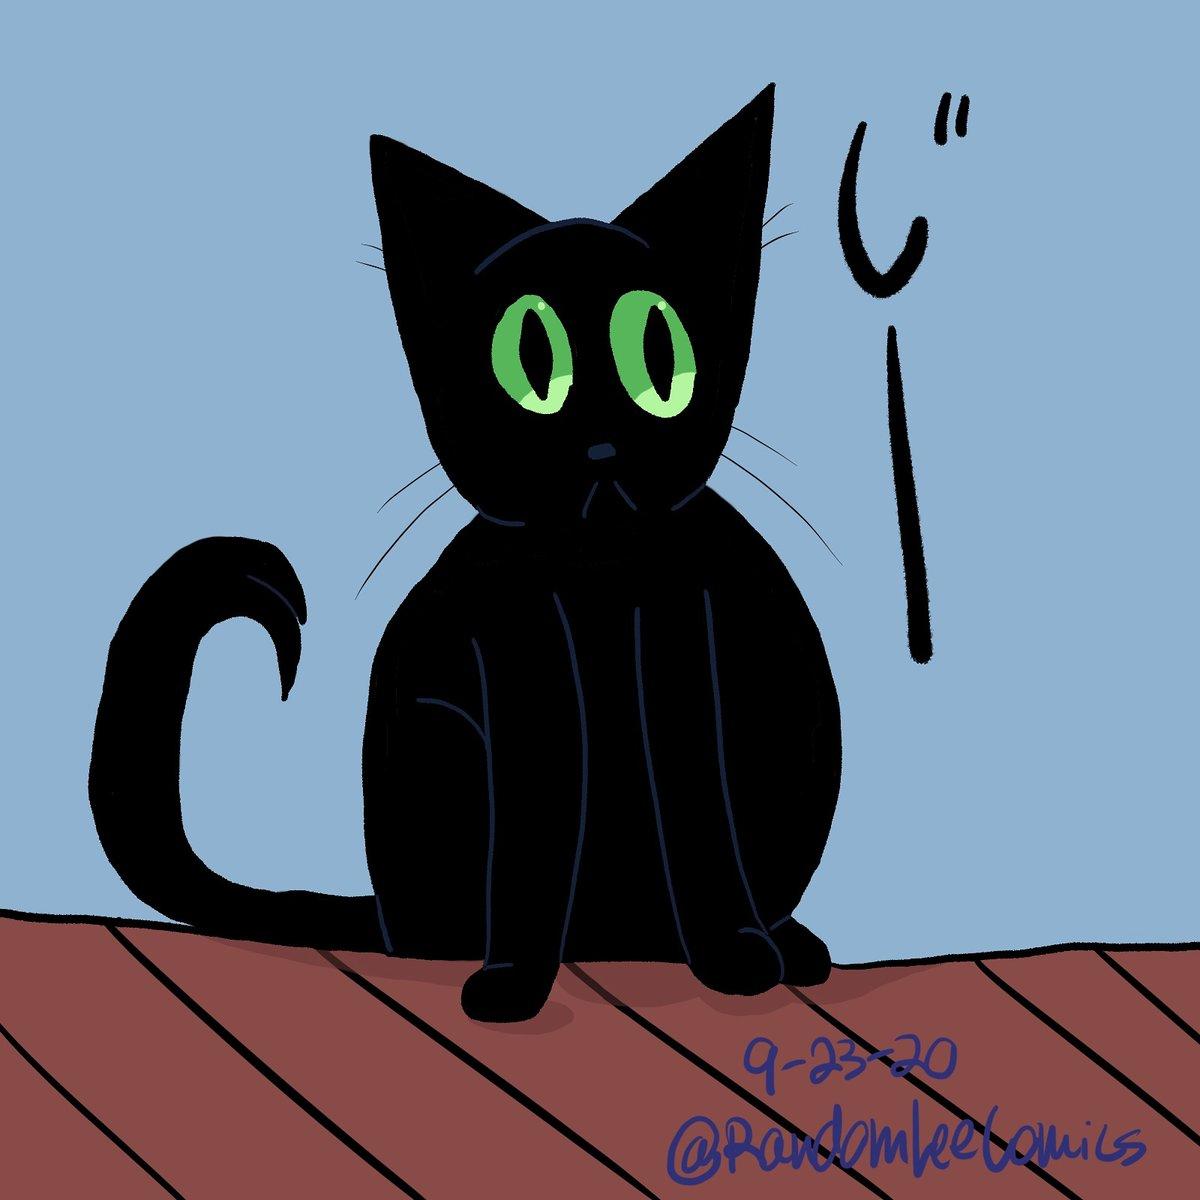 "Nosy likes to stare 🐱 (""Jiii~"")#digitalart #art #illustration #funny #digitalillustration #digital #sketch #digitalpainting #procreate #draw #drawing #illustrator #wednesday #doodle  #cartoon #cute #kawaii #sketchbook #manga #anime #chibi #comic #sketching #comicstrip #pets #cat https://t.co/ORYEdT4Un0"